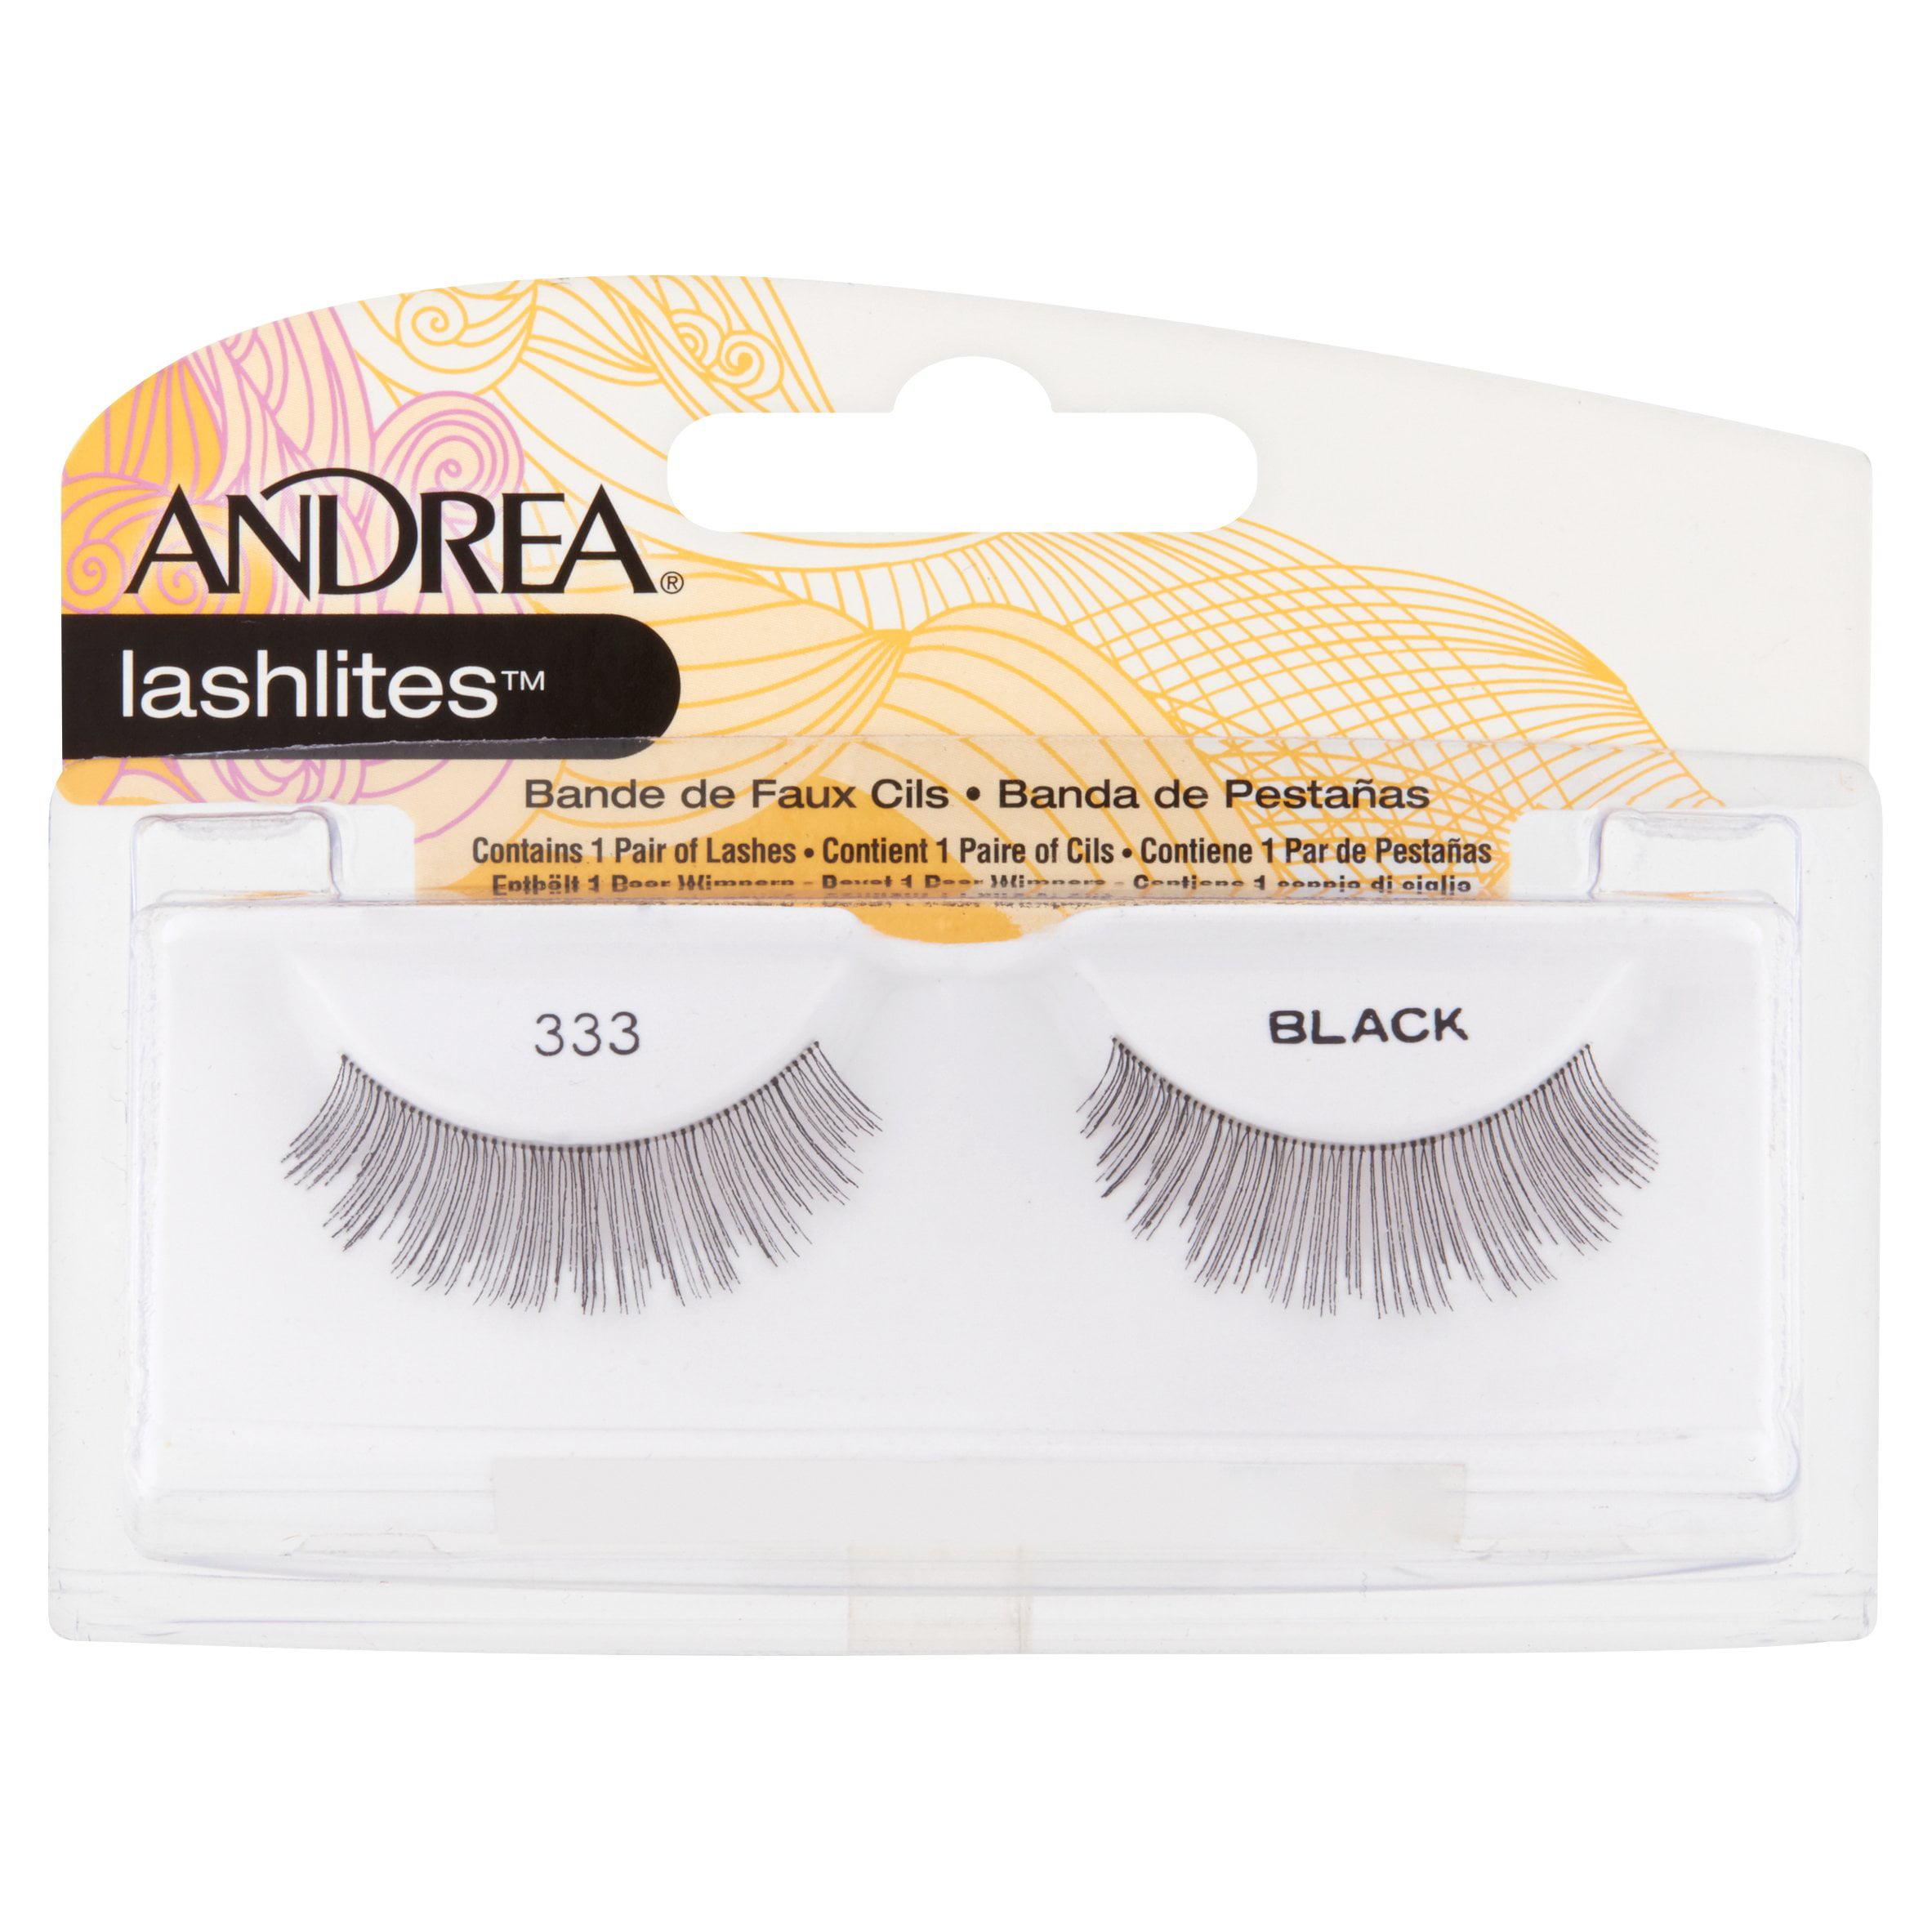 Andrea Lashlites 333 Black False Eyelashes, 1 pair